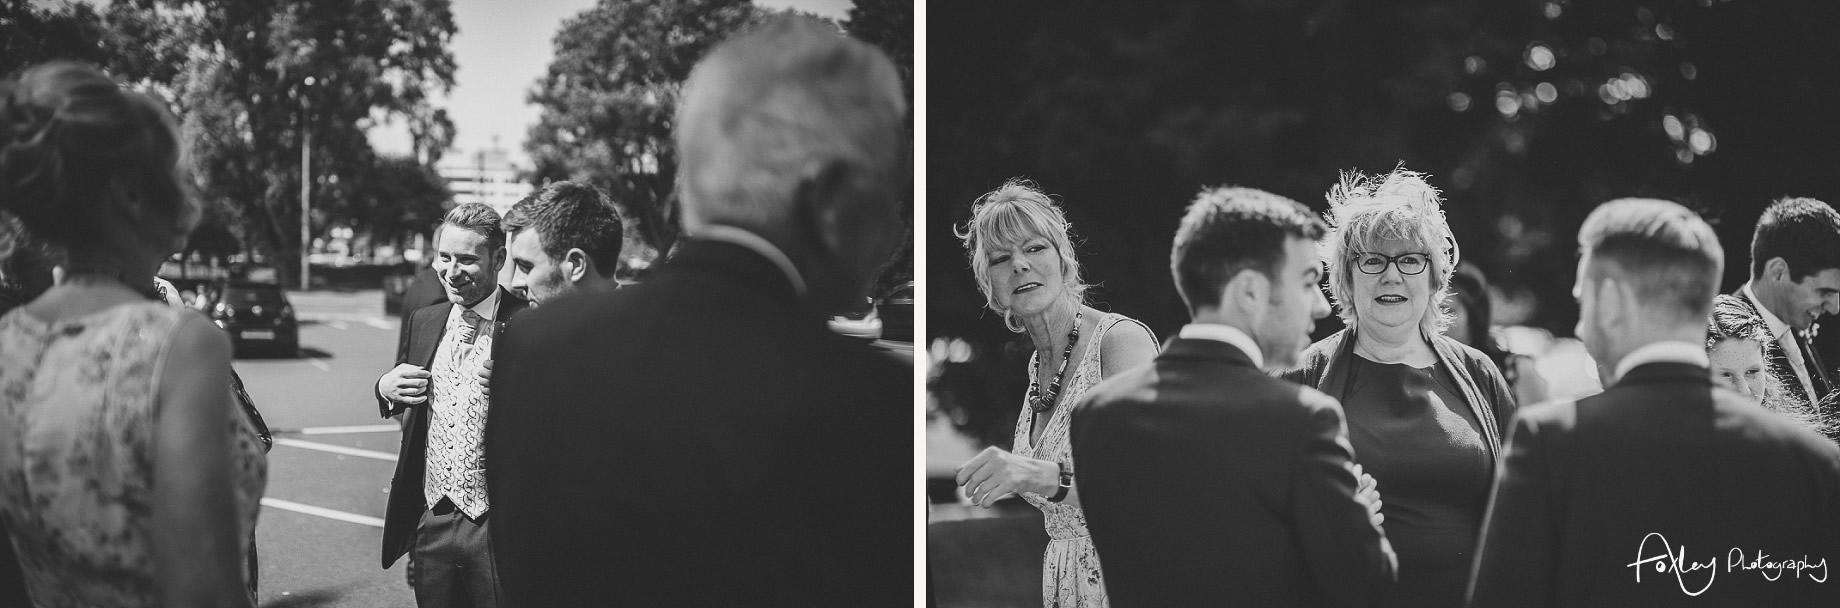 Rebecca and Dan Wedding at Preston Marriott Hotel 025